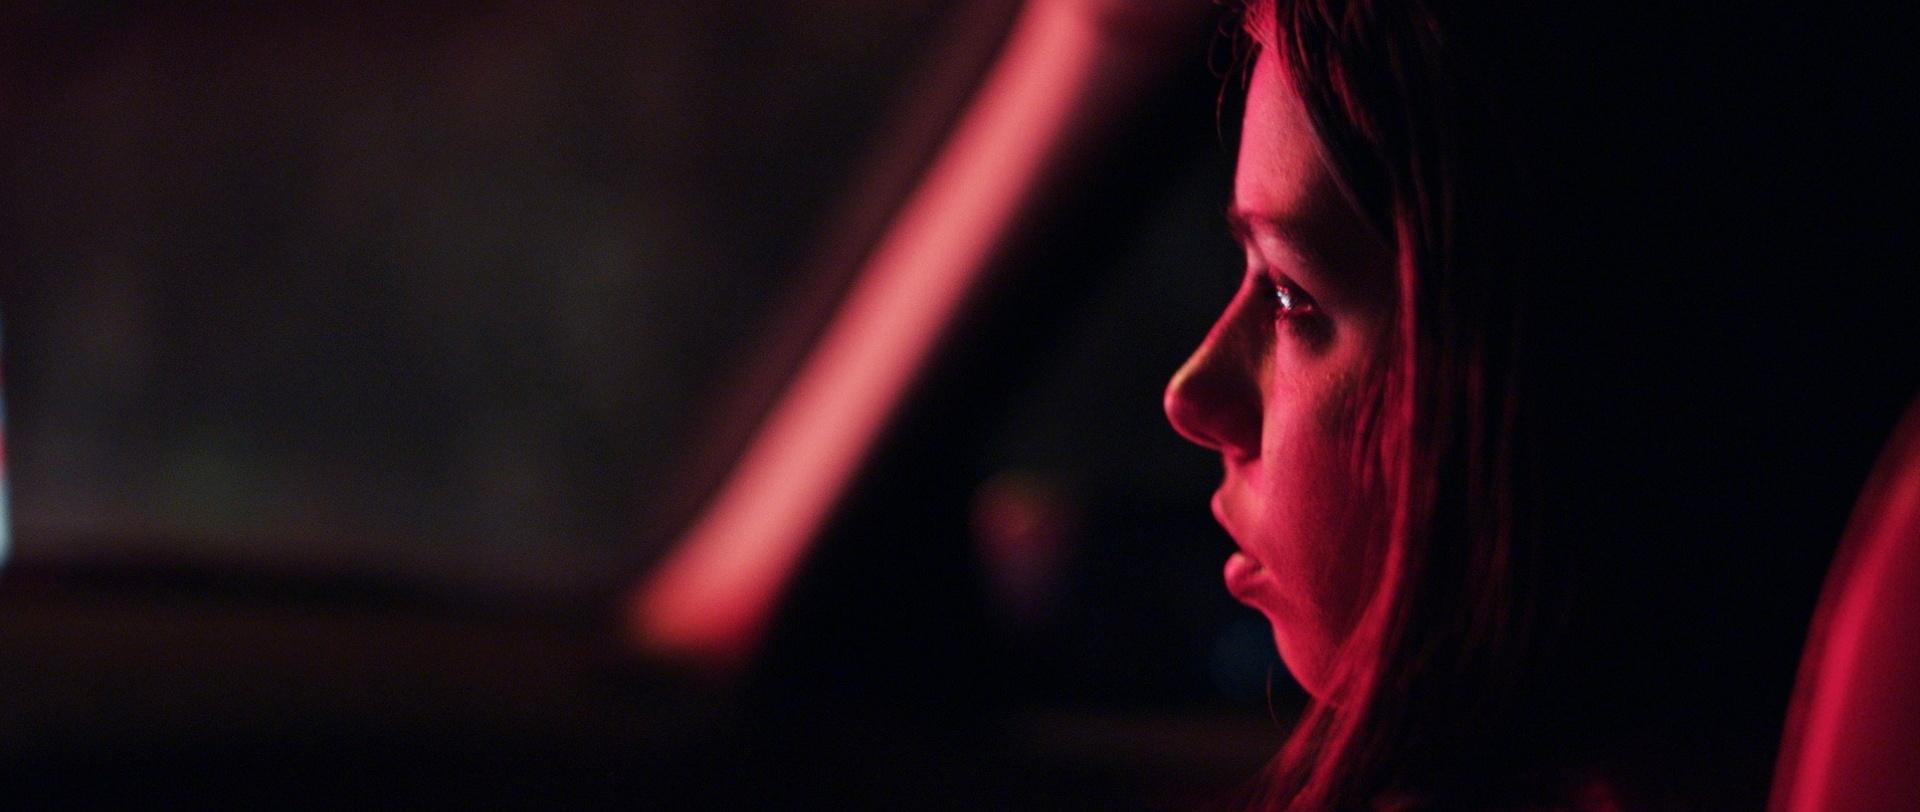 Traumland - Dreamland - Die Prostituierte Mia Nachts im Auto - Regie Petra Volpe - Kamera Judith Kaufmann